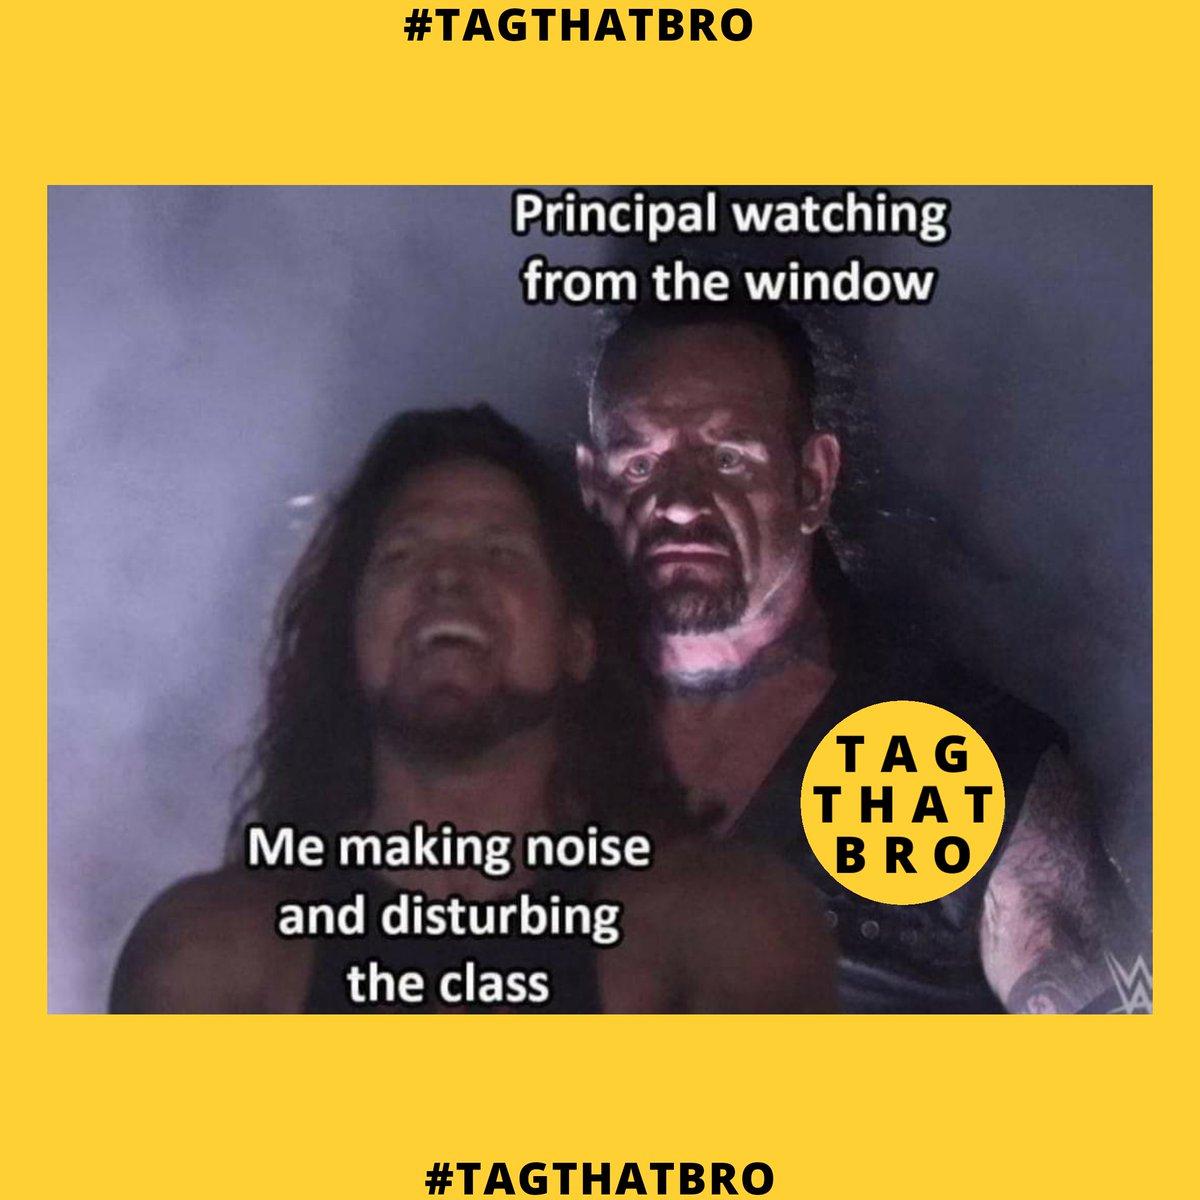 Tag That Bro - Follow us @tagthatbro  #tagthatbro #memes#dankmemes #memes#memesdaily #memesespanol #memestagram #funnymemes #edgymemes #memester #memesdank #memesfordays #memeschile #memesfunny #dailymemes #memess #memestar #memestagram #memesrlife #memesquadpic.twitter.com/dtpPJMvzRH